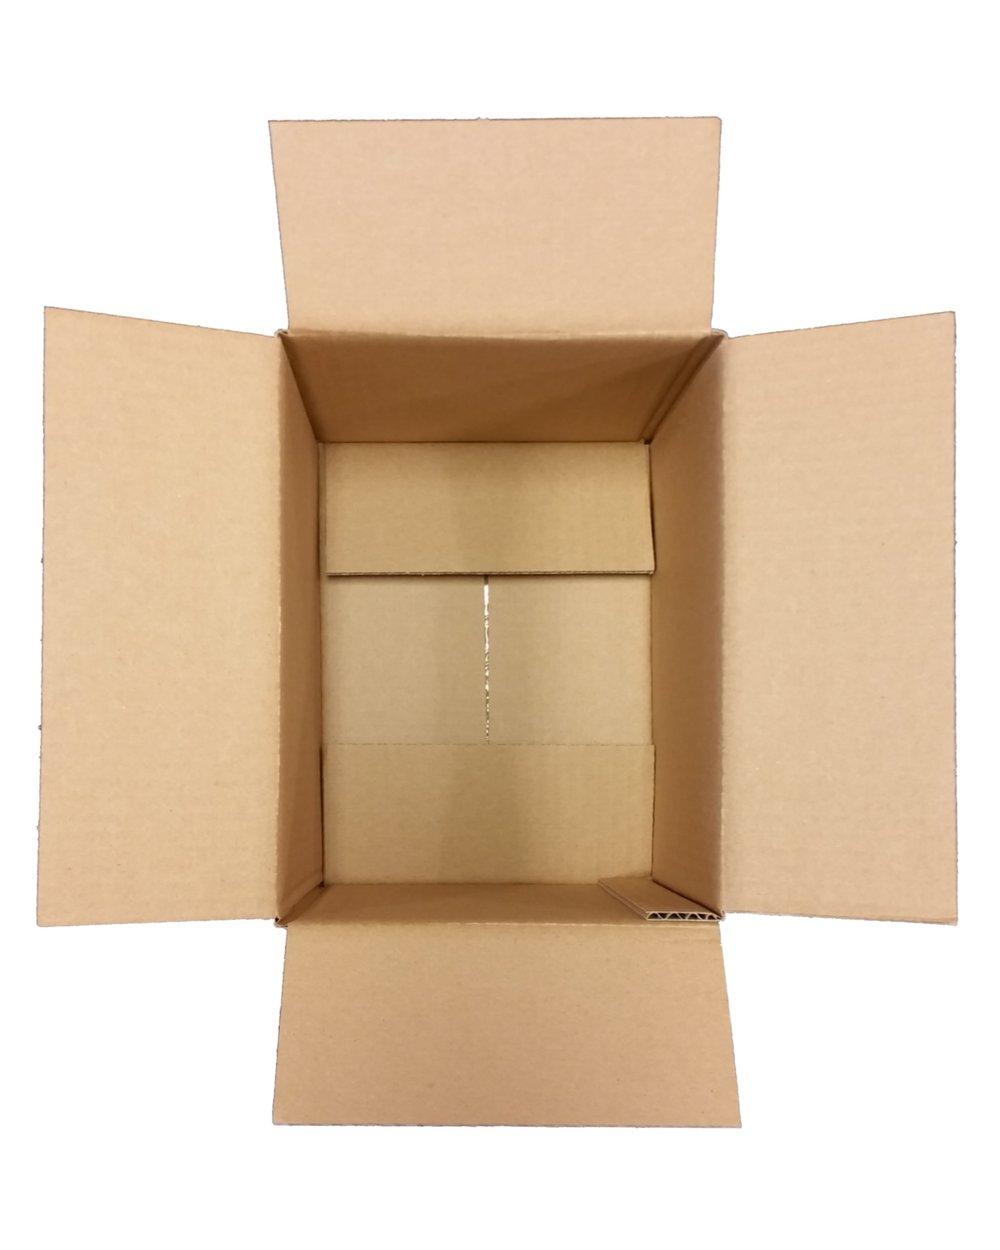 box-2098116_1920.jpg